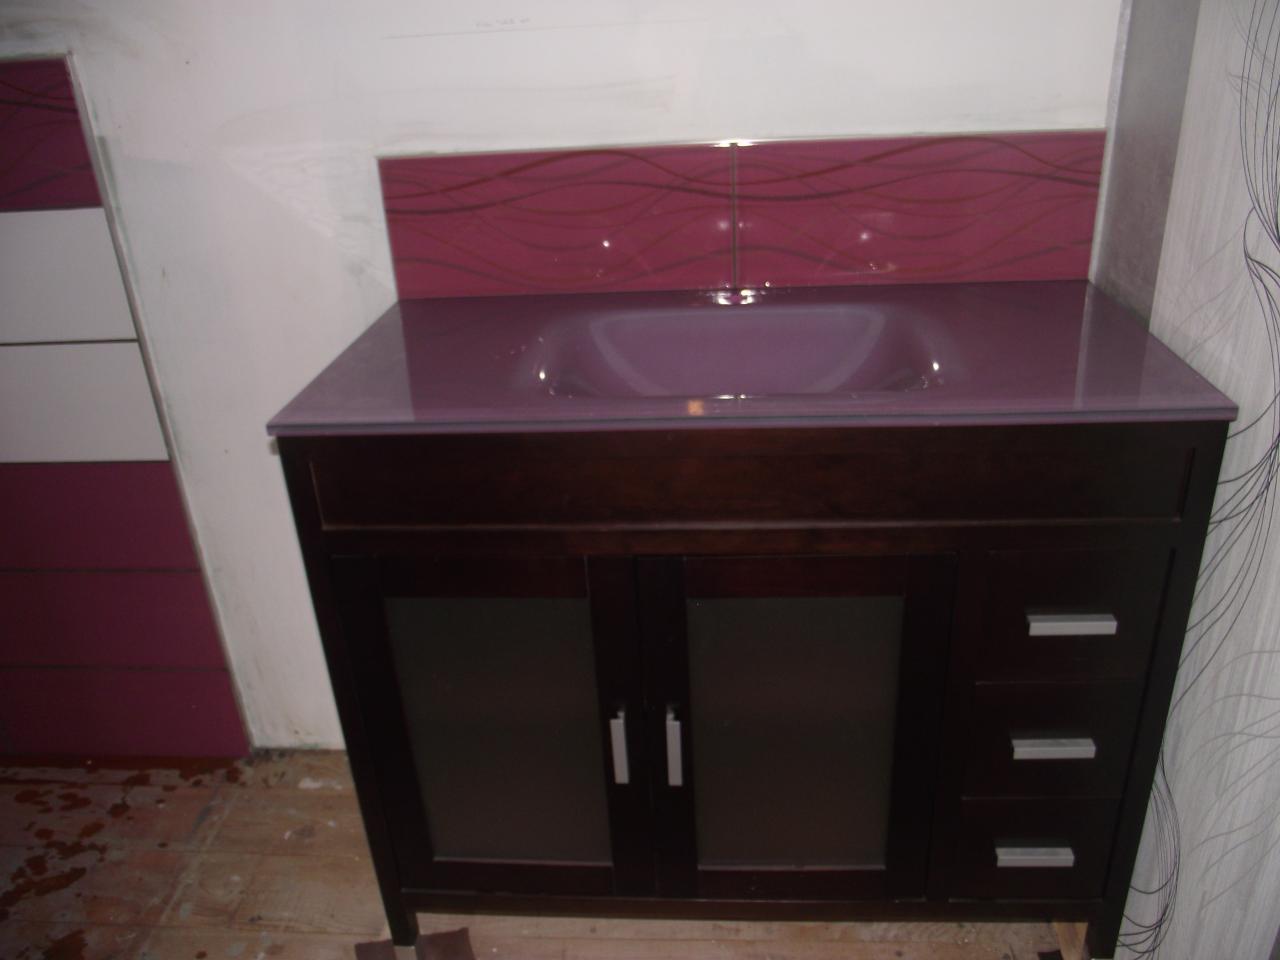 Carrelage pos au dessus lavabo sdb for Aquamondo salle de bain